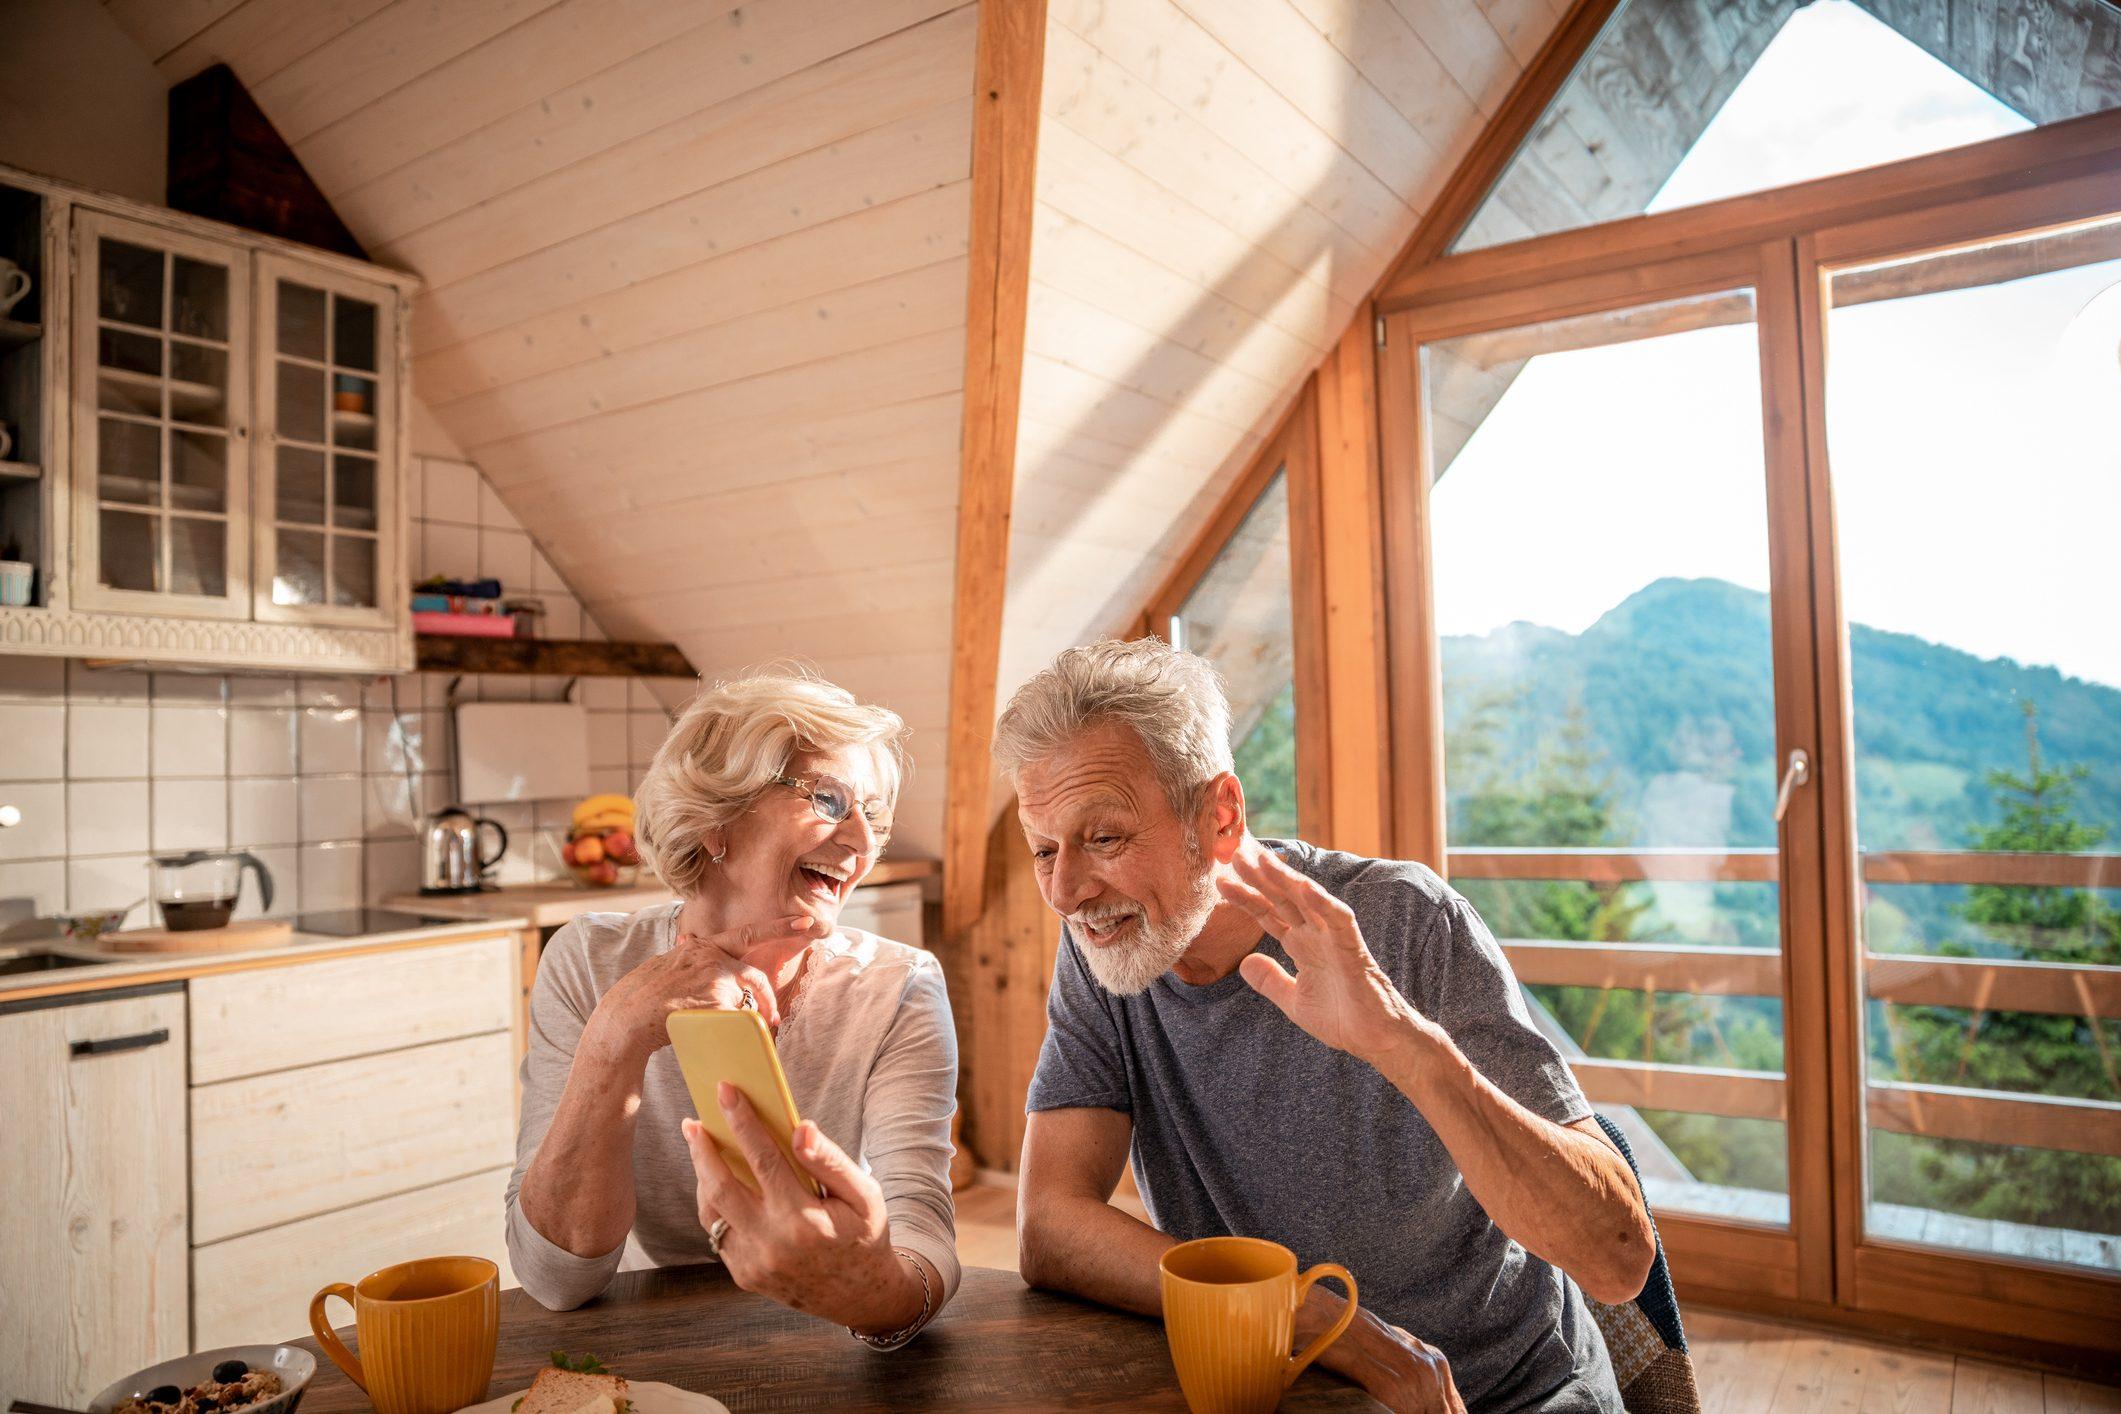 Senior couple having a video call on their phone